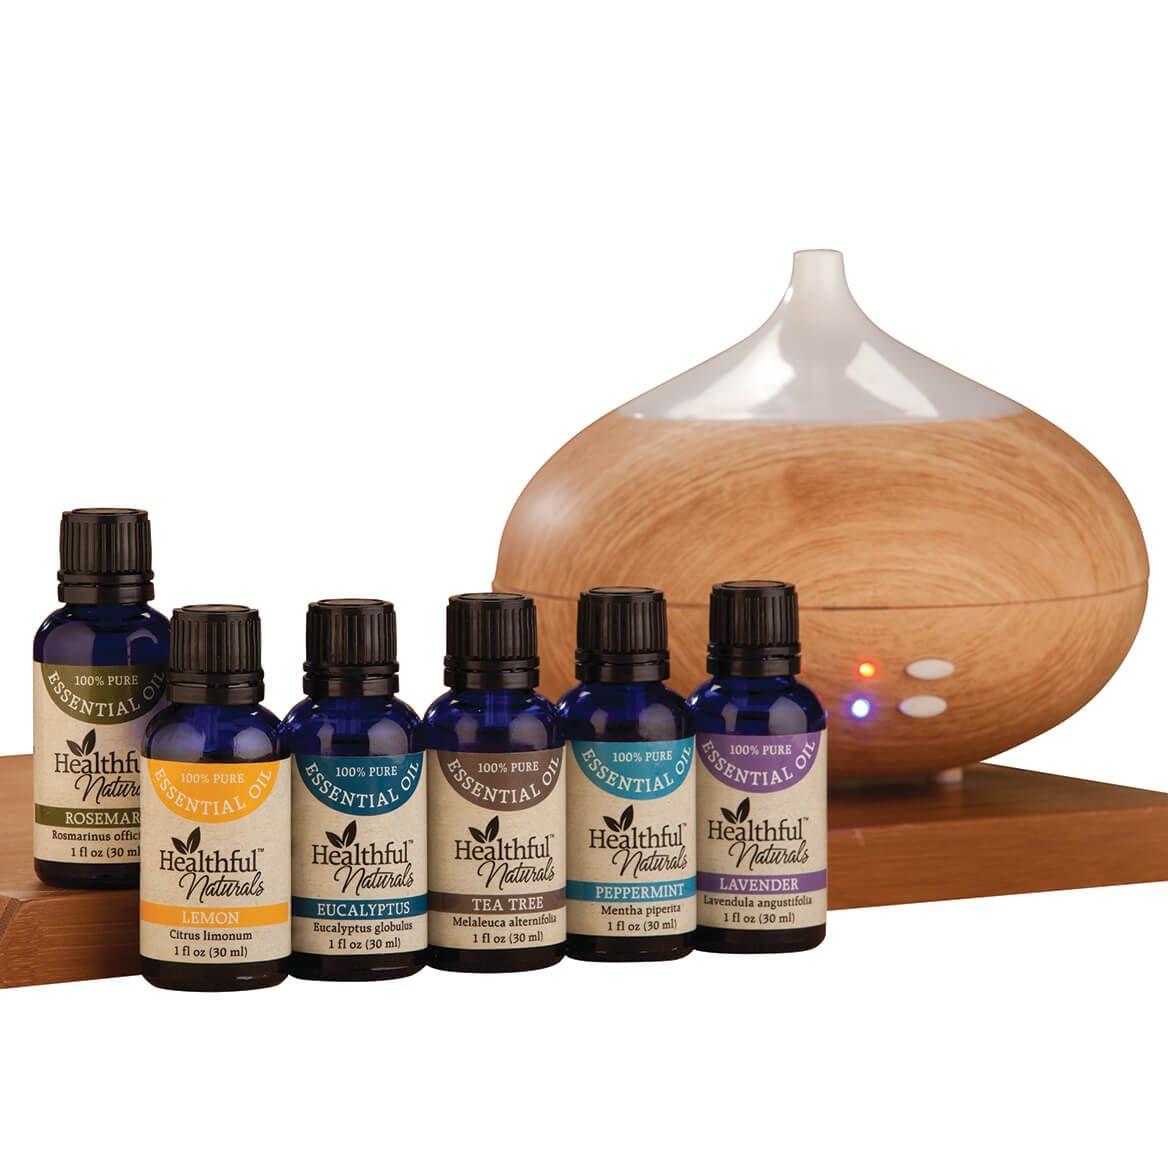 Healthful™ Naturals Starter Essential Oil Kit & 280 ml Diffuser-354043